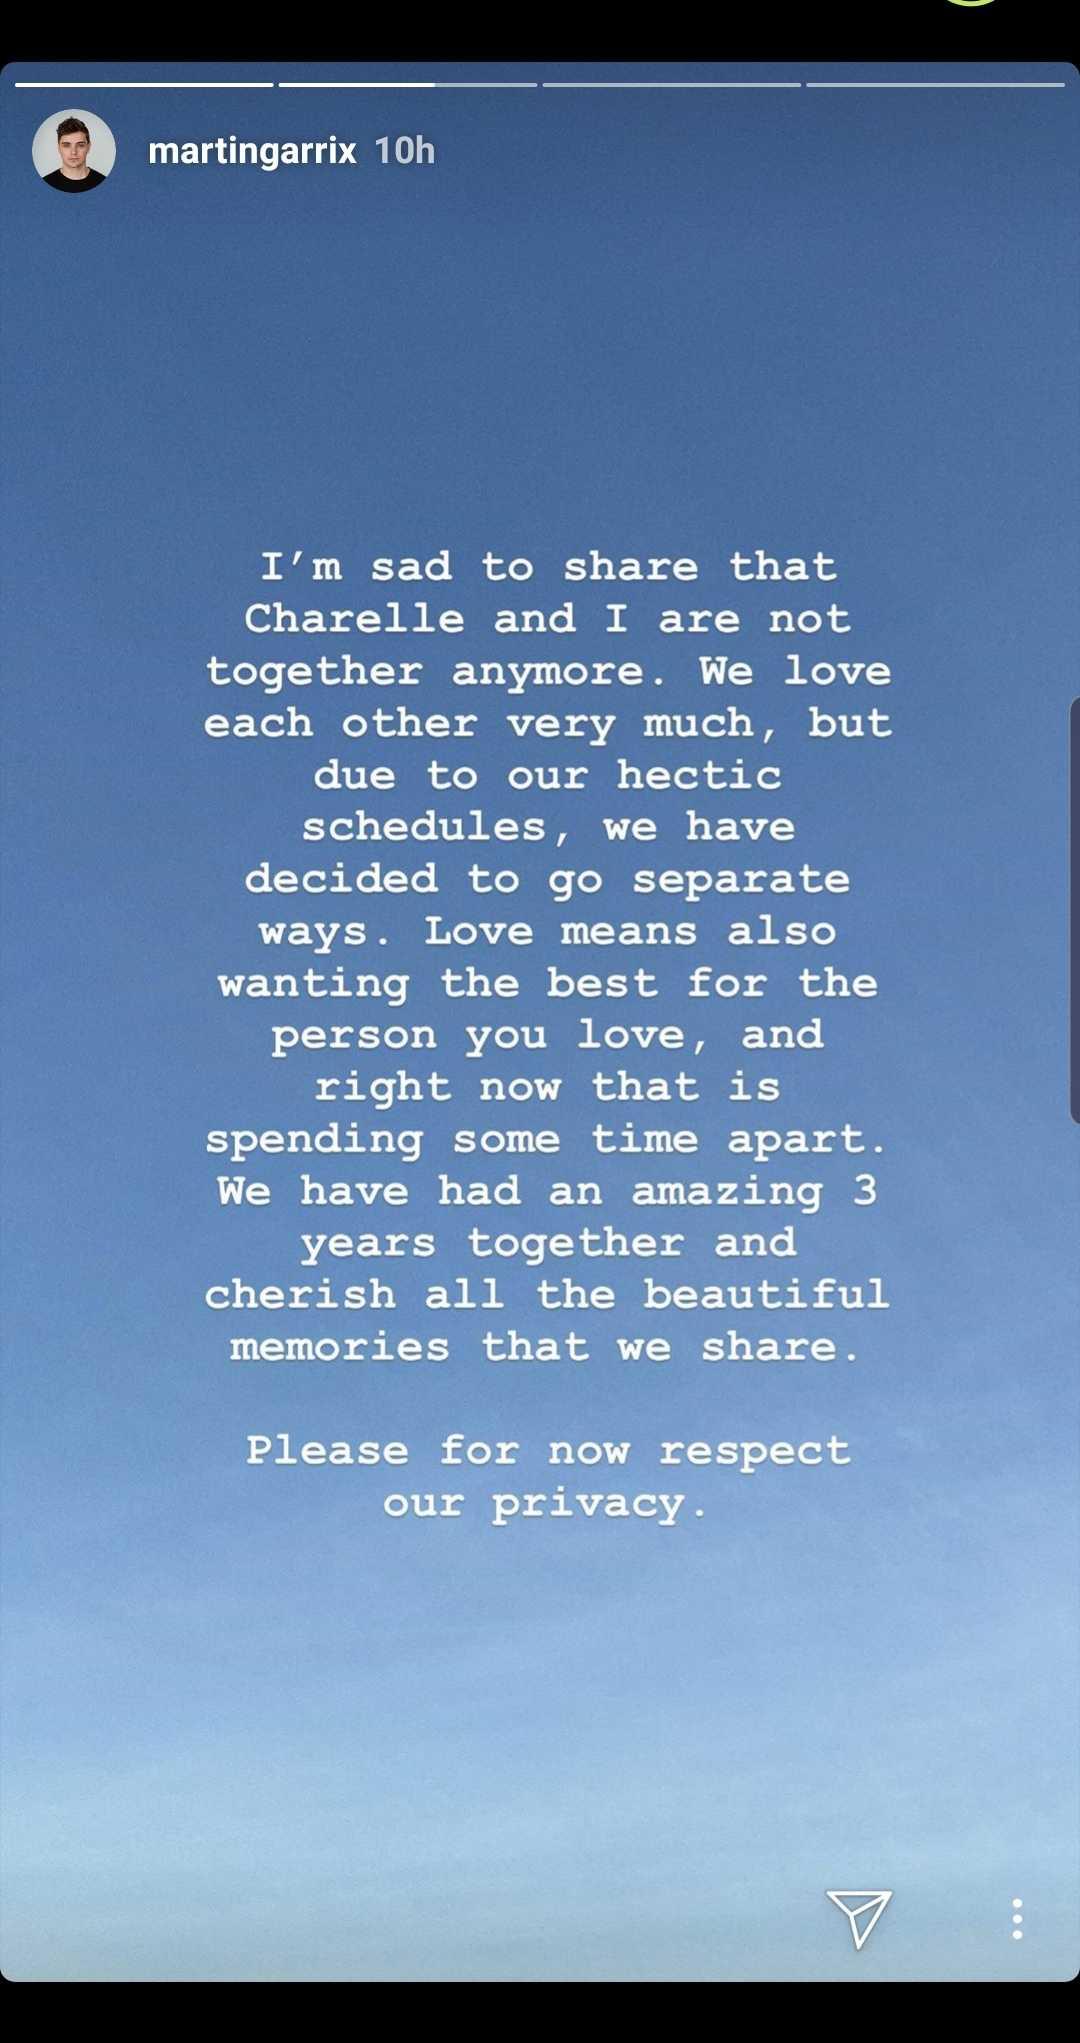 Martin Garrix Publicly Breaks Up with Super Model Girlfriend